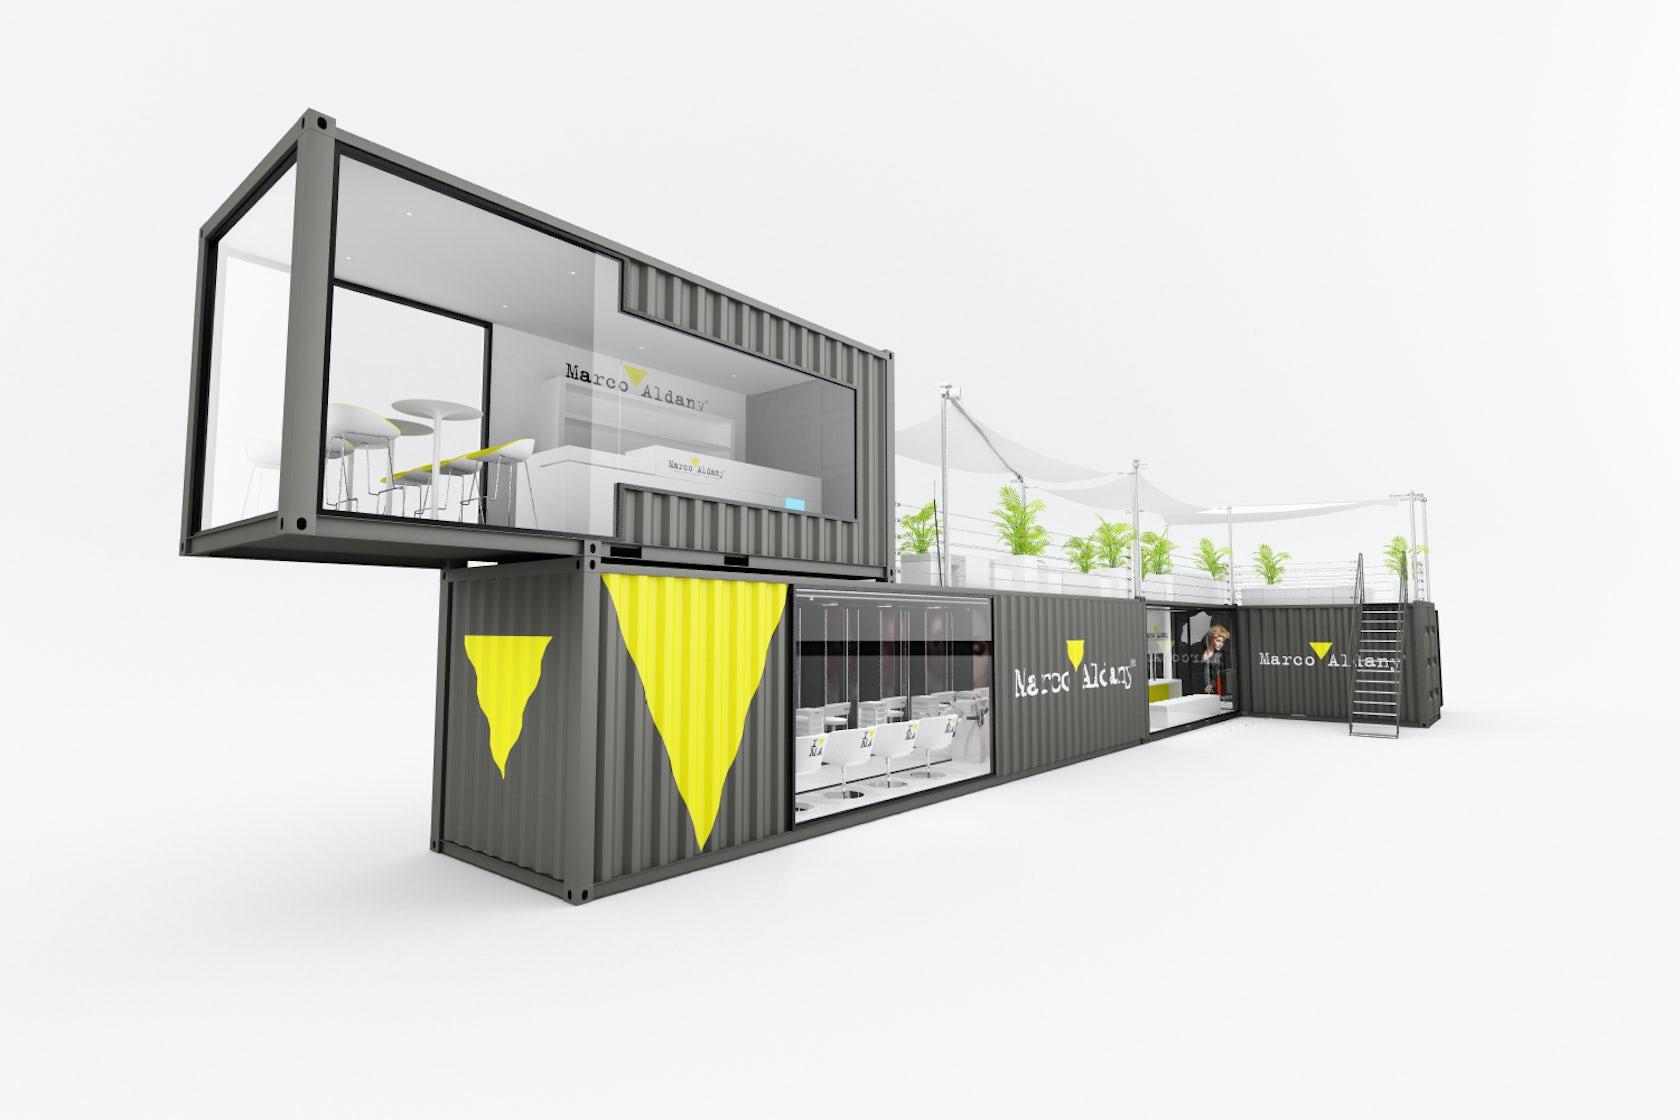 marco aldany pop up beauty salon architizer. Black Bedroom Furniture Sets. Home Design Ideas